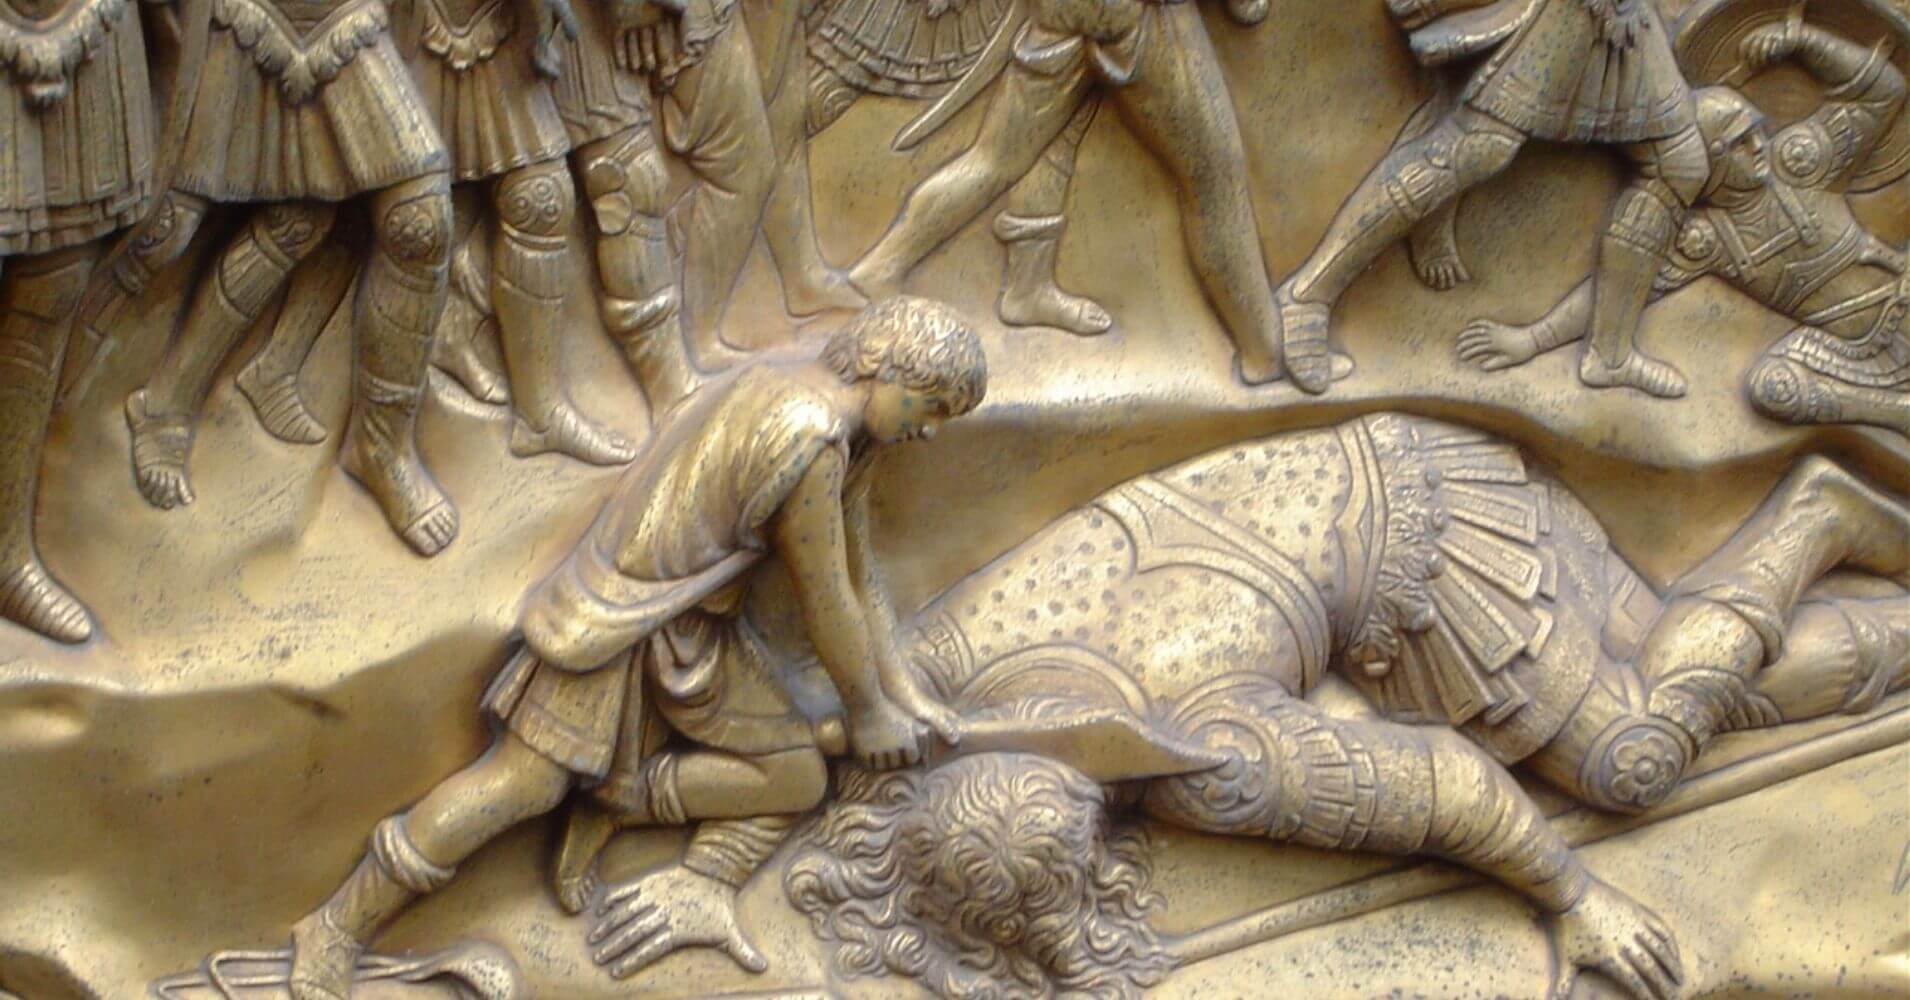 David Degollando a Goliat. Puertas del Paraíso, Baptisterio de Florencia. Toscana, Italia.